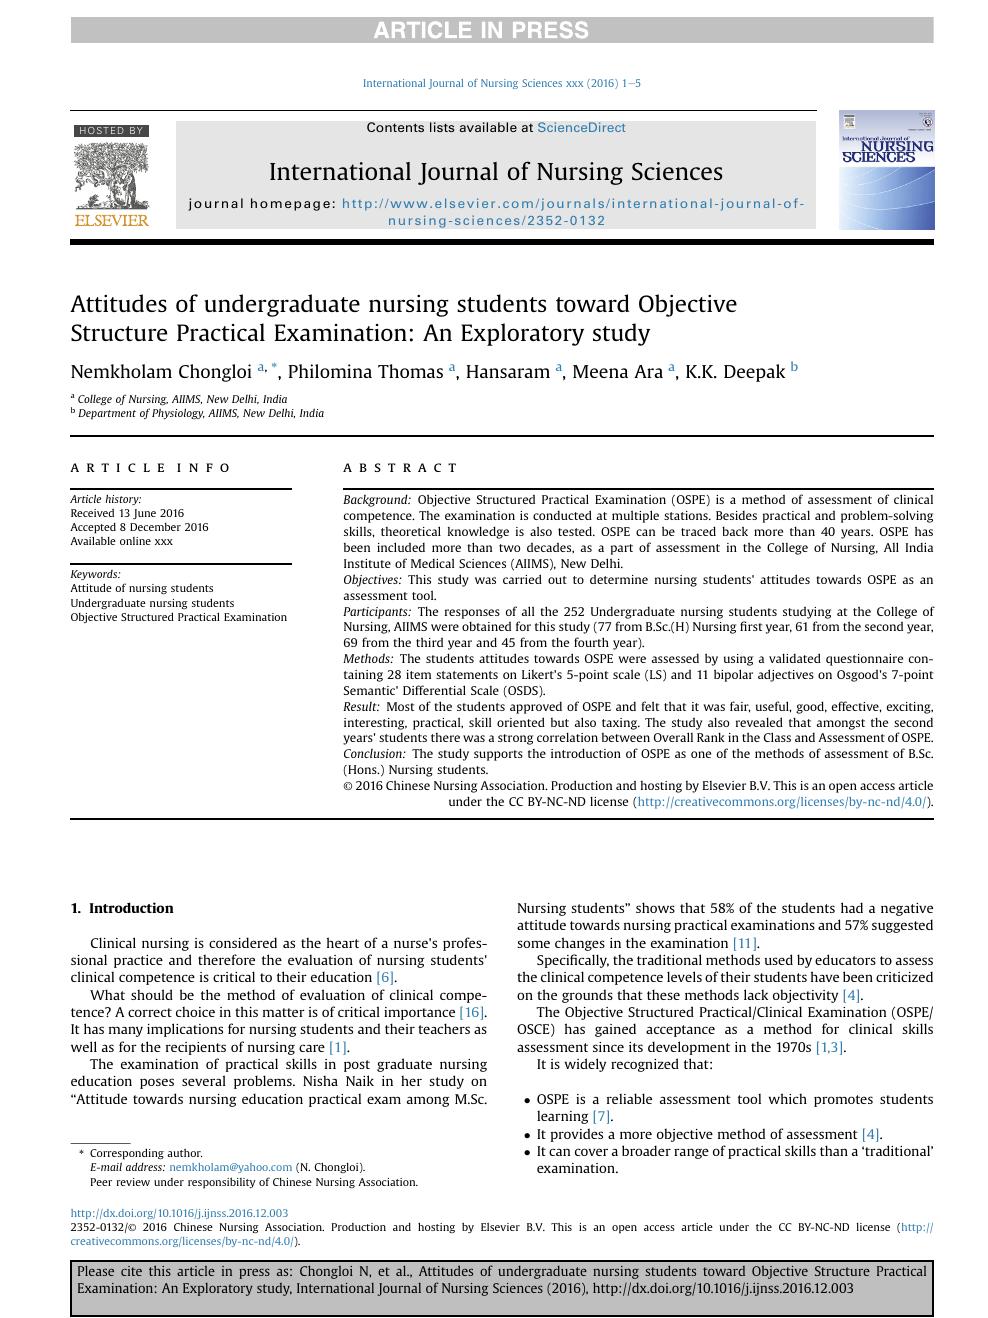 Attitudes of undergraduate nursing students toward Objective